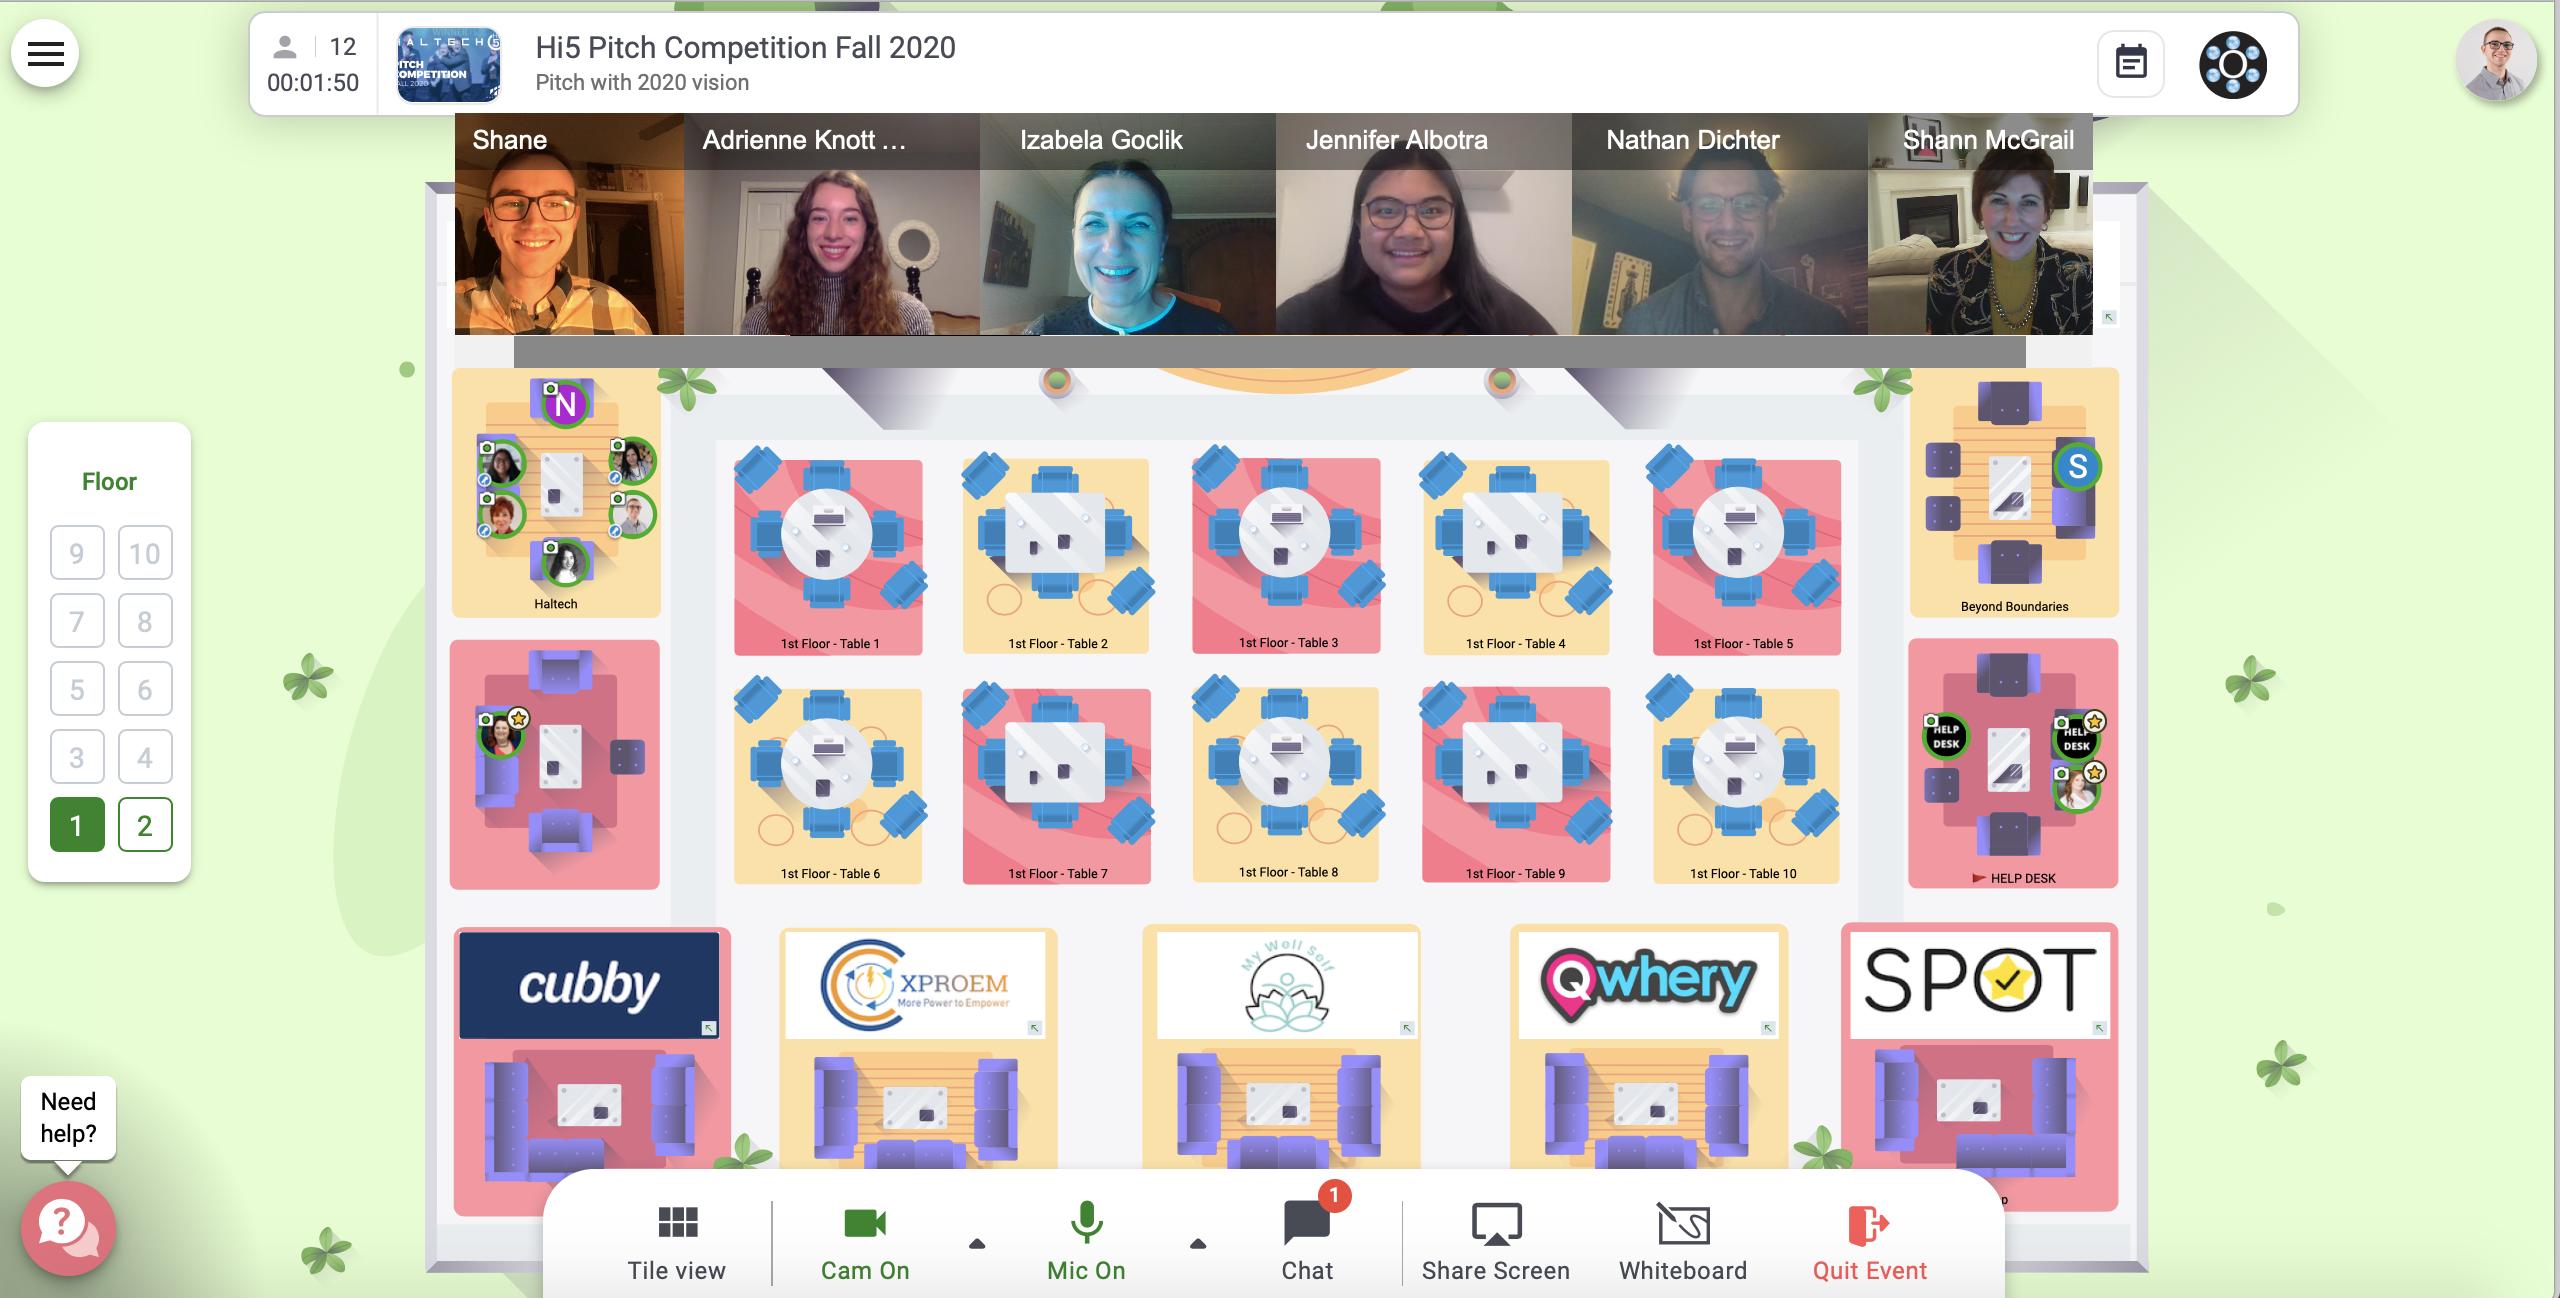 Team Screenshot Hi5 2020